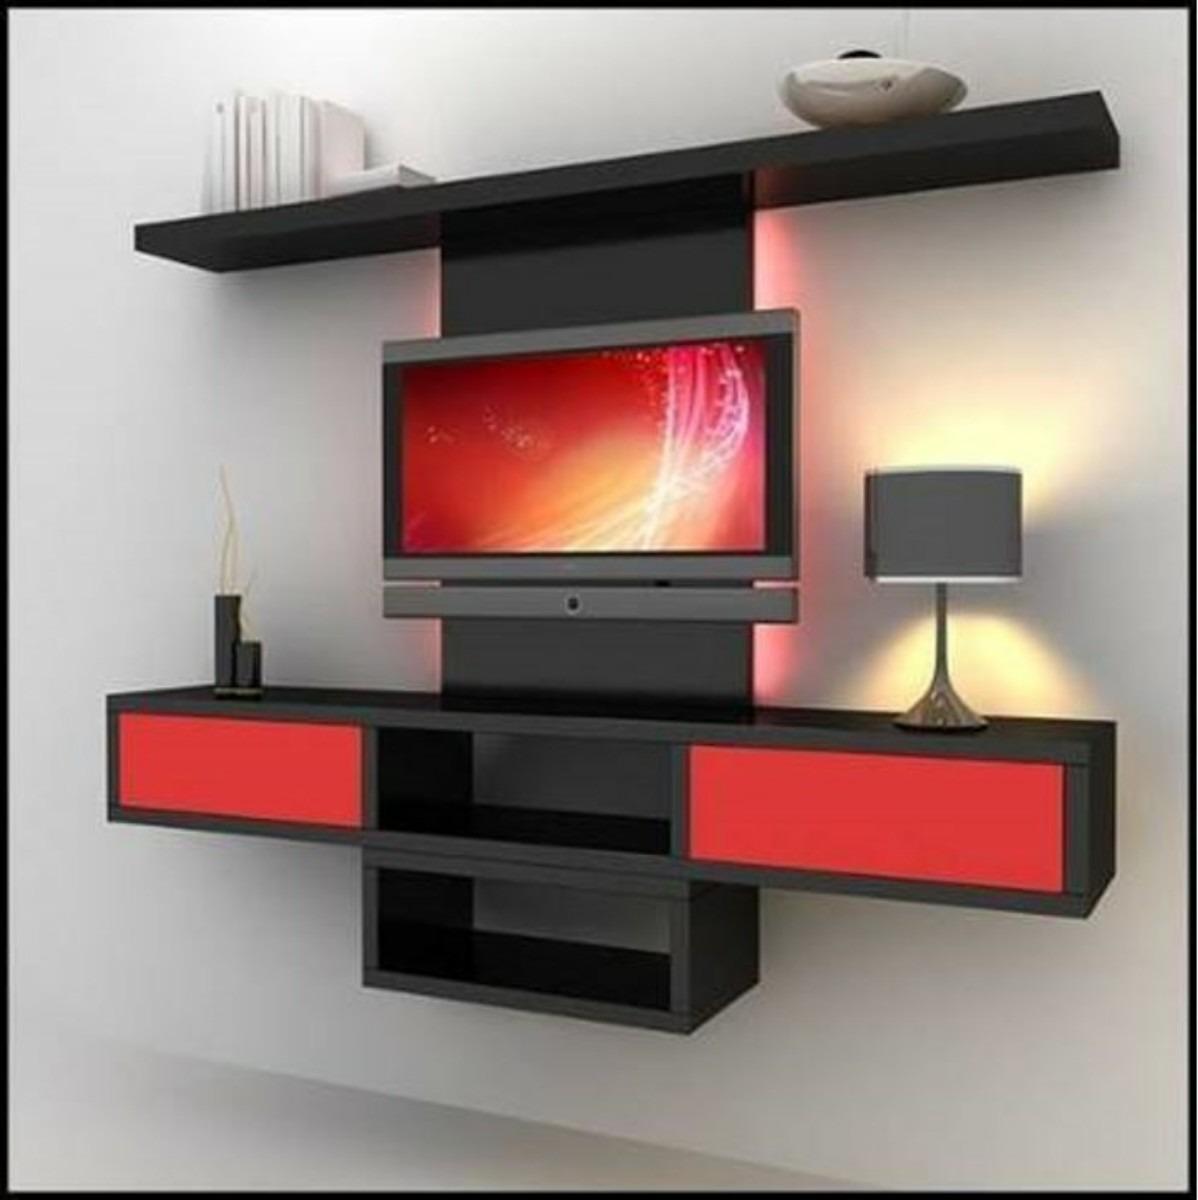 Mesas muebles modernos minimalista para tv somos for Muebles contemporaneos modernos